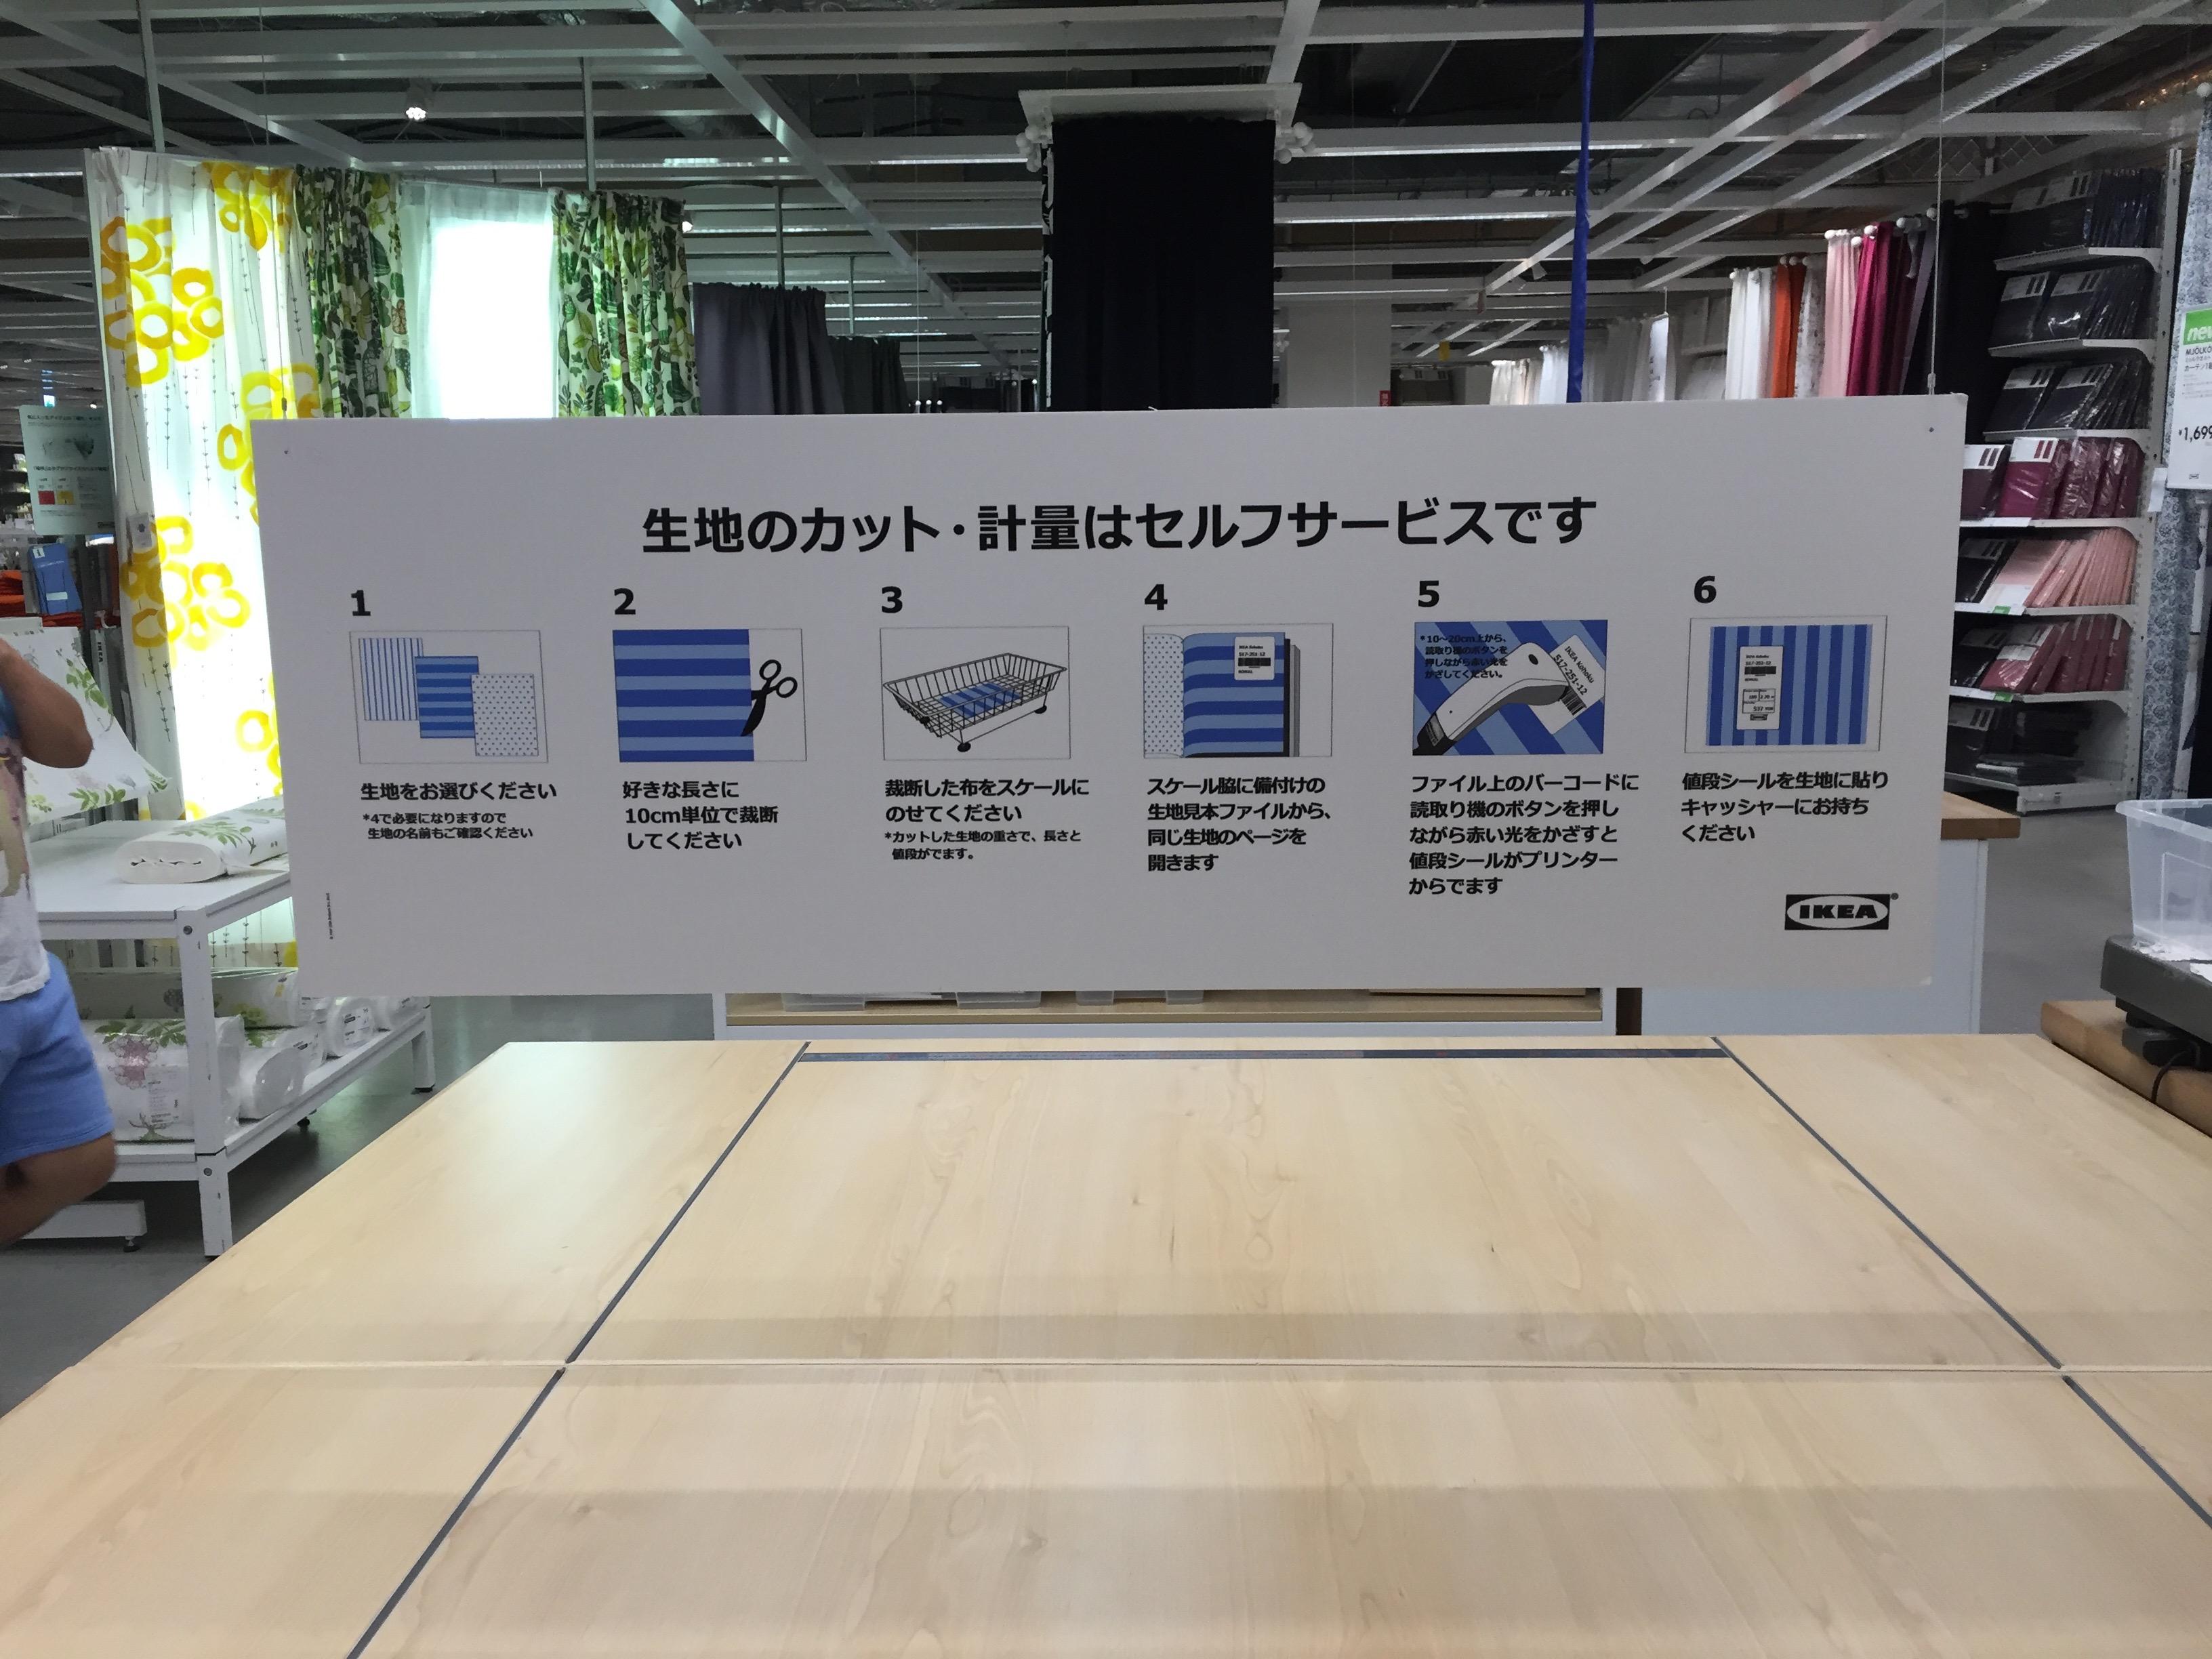 "Let's Visit IKEA Japan, or ""Mītobōru, Onegaishimasu ..."